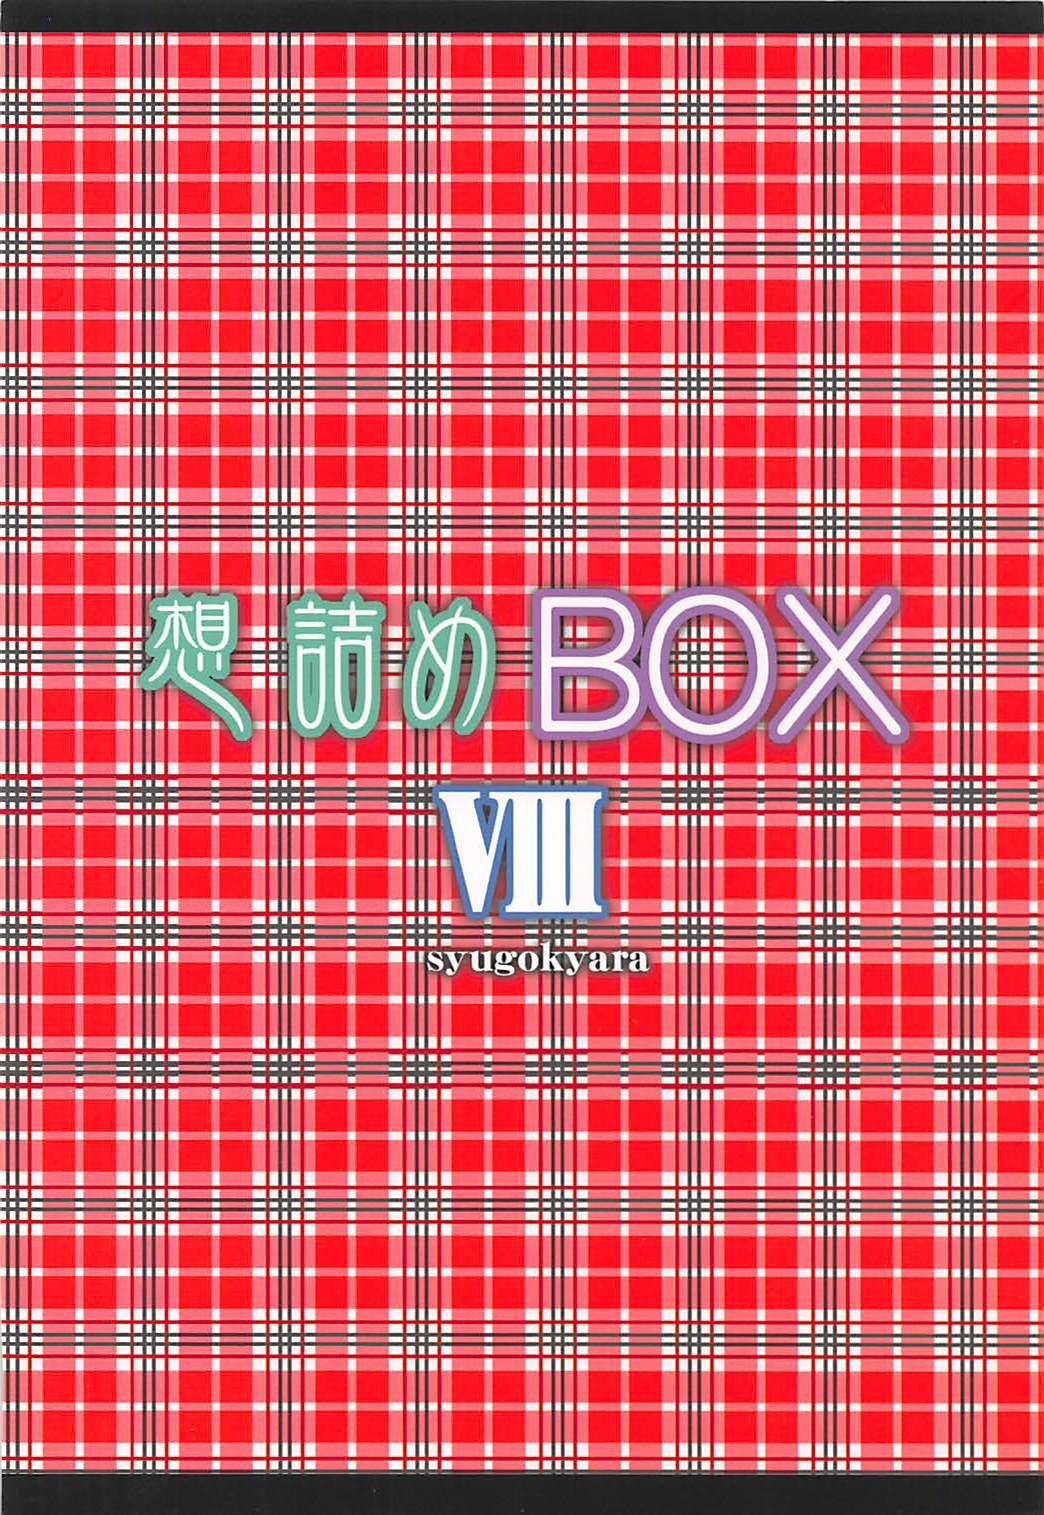 Omodume BOX VIII 25